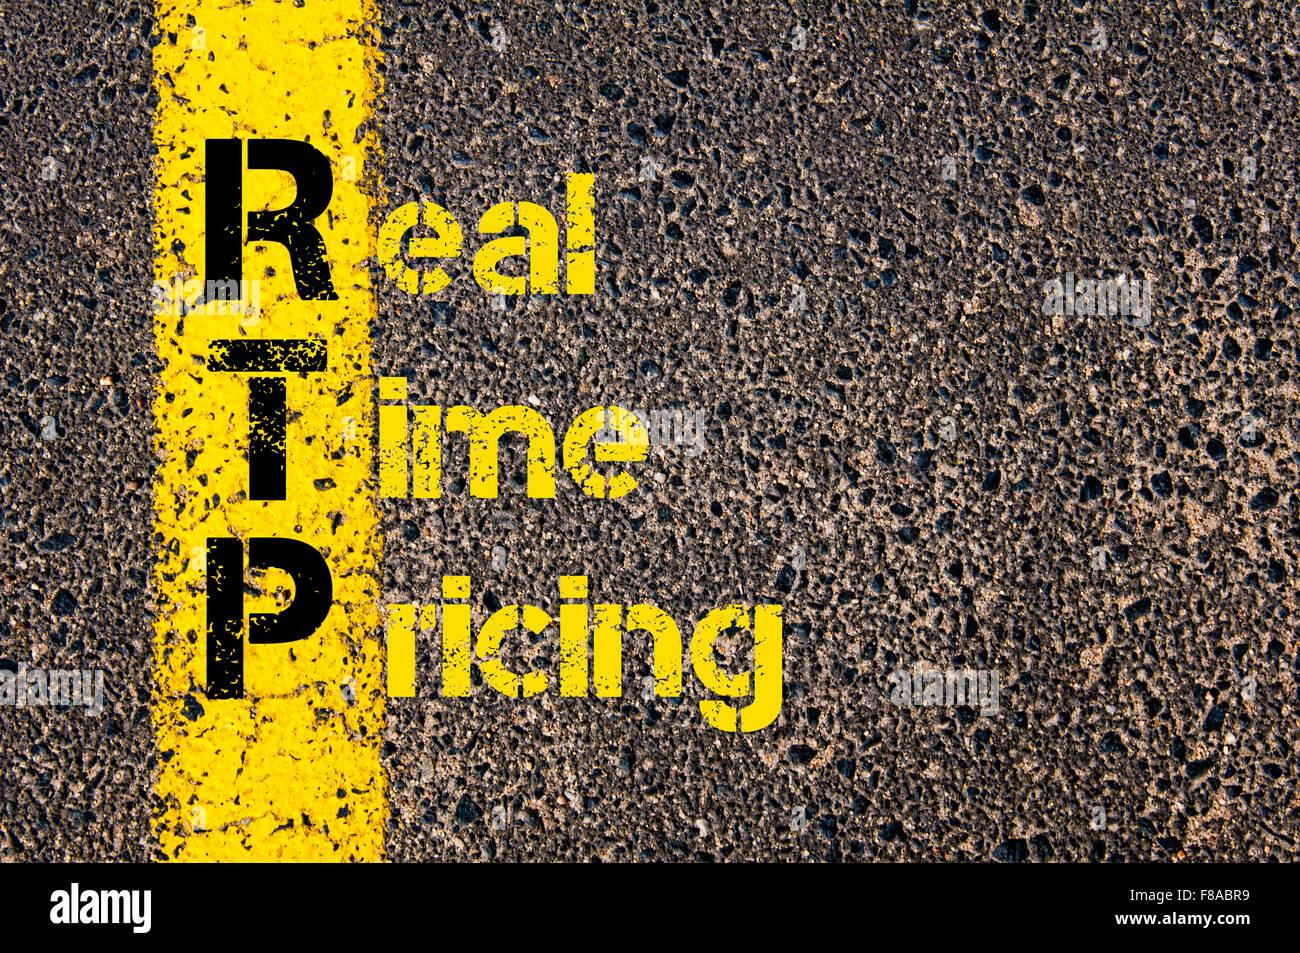 Concept image of Accounting Business Acronym xxxxxxxxxxxxxxxxx  written over road marking yellow paint line. Stock Photo